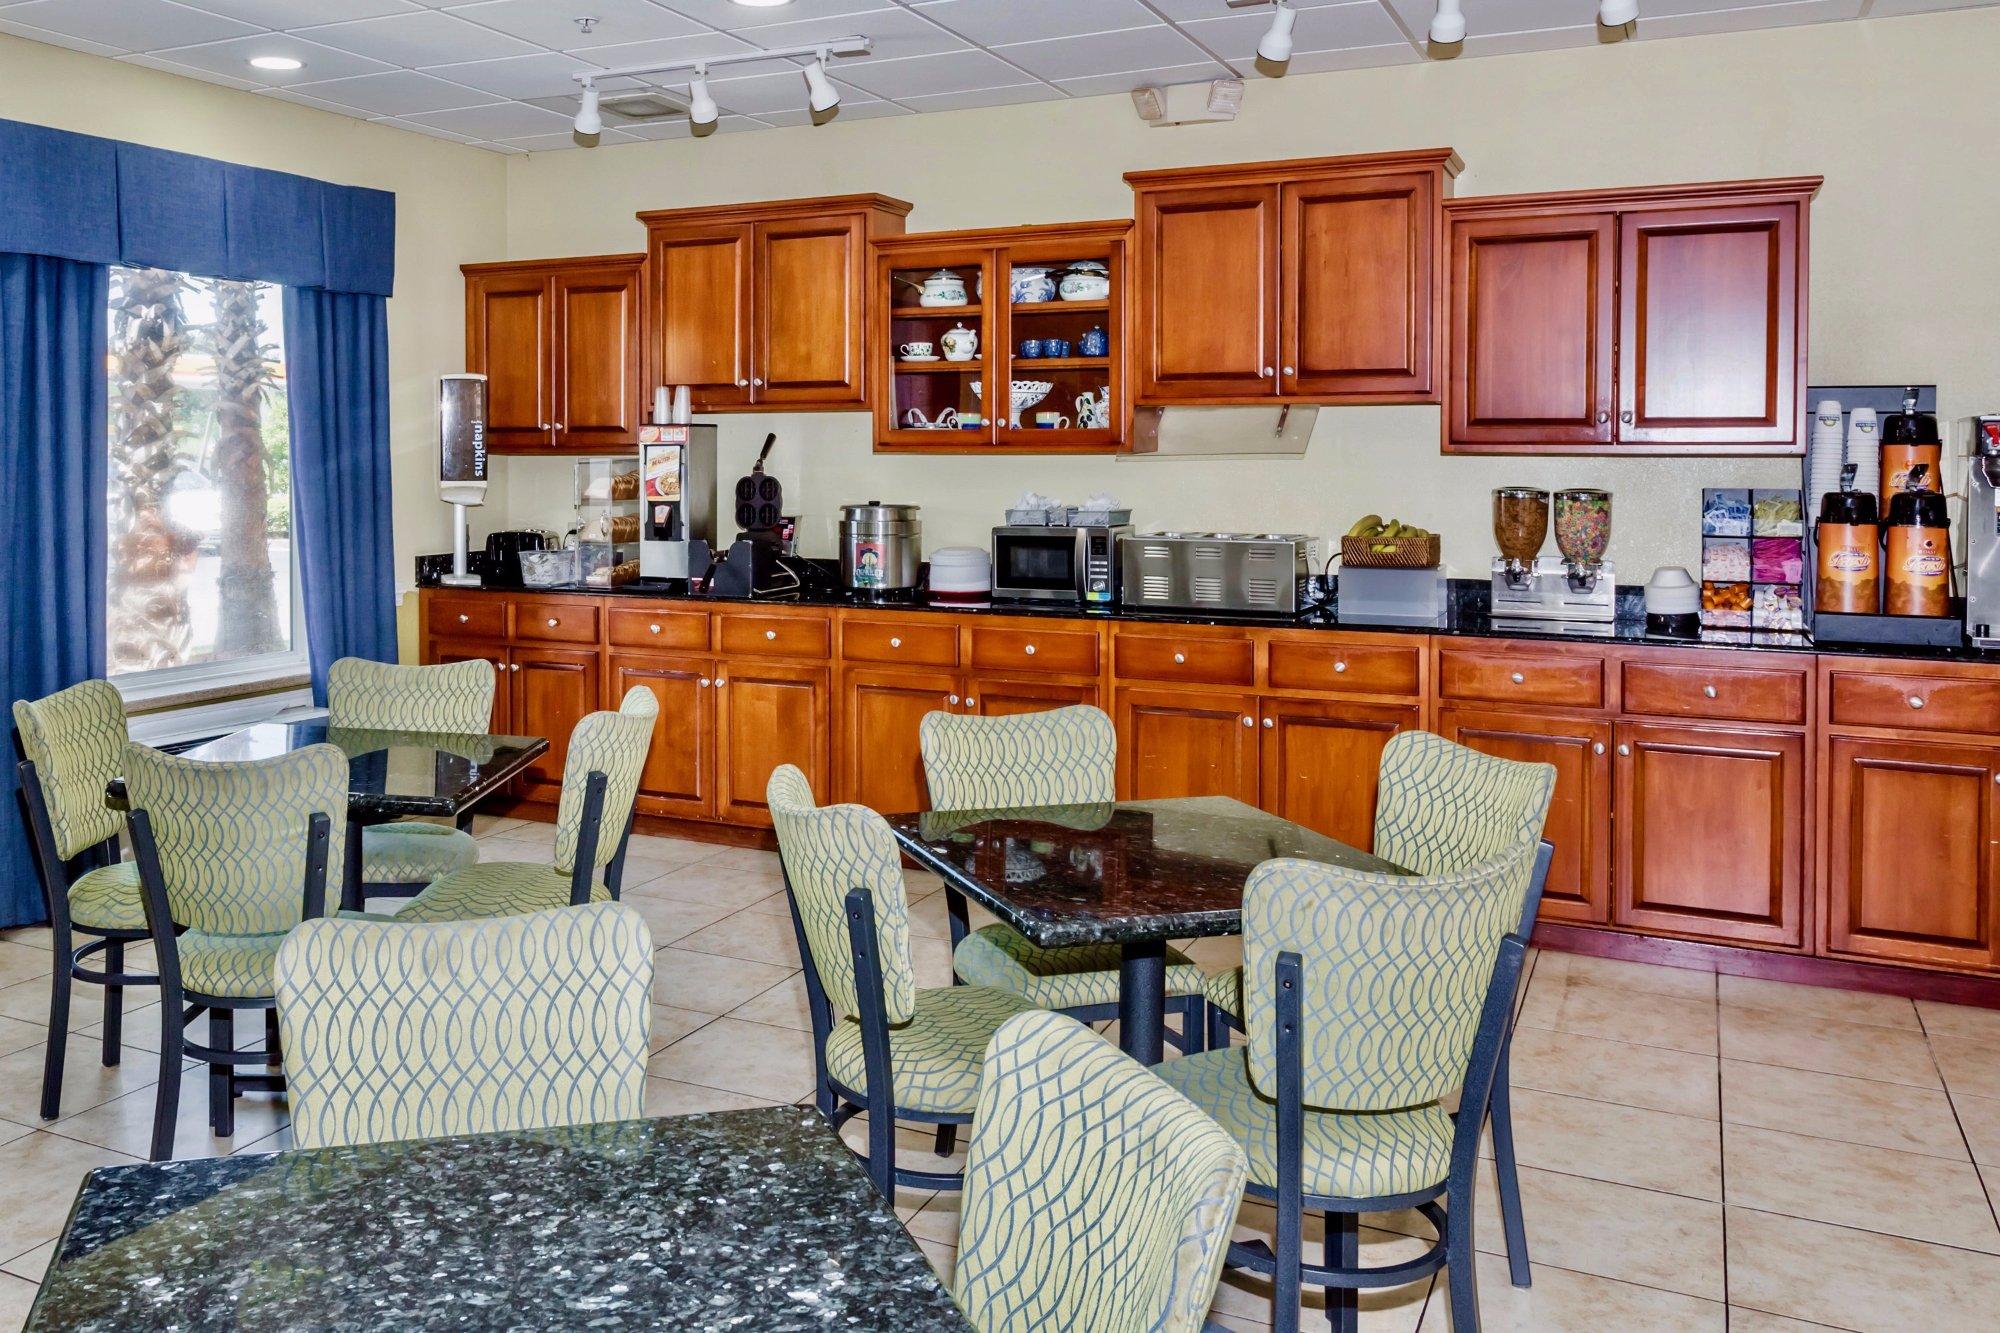 Days Inn & Suites - Savannah North I-95